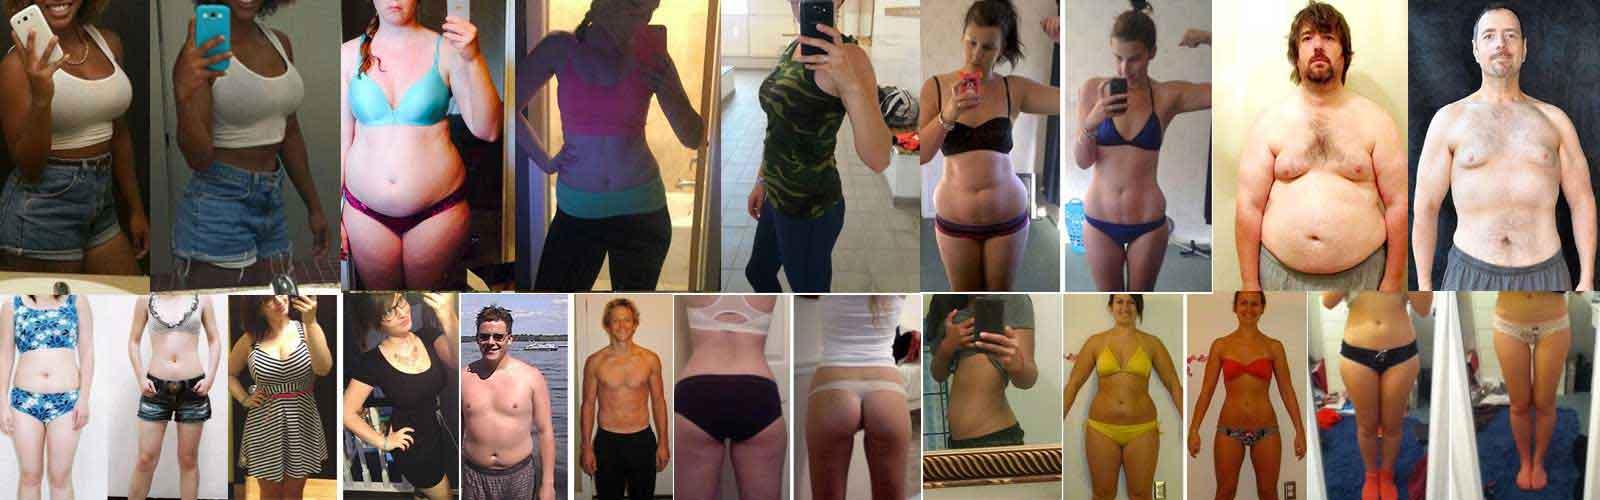 phentaslim customer testimonials before and after